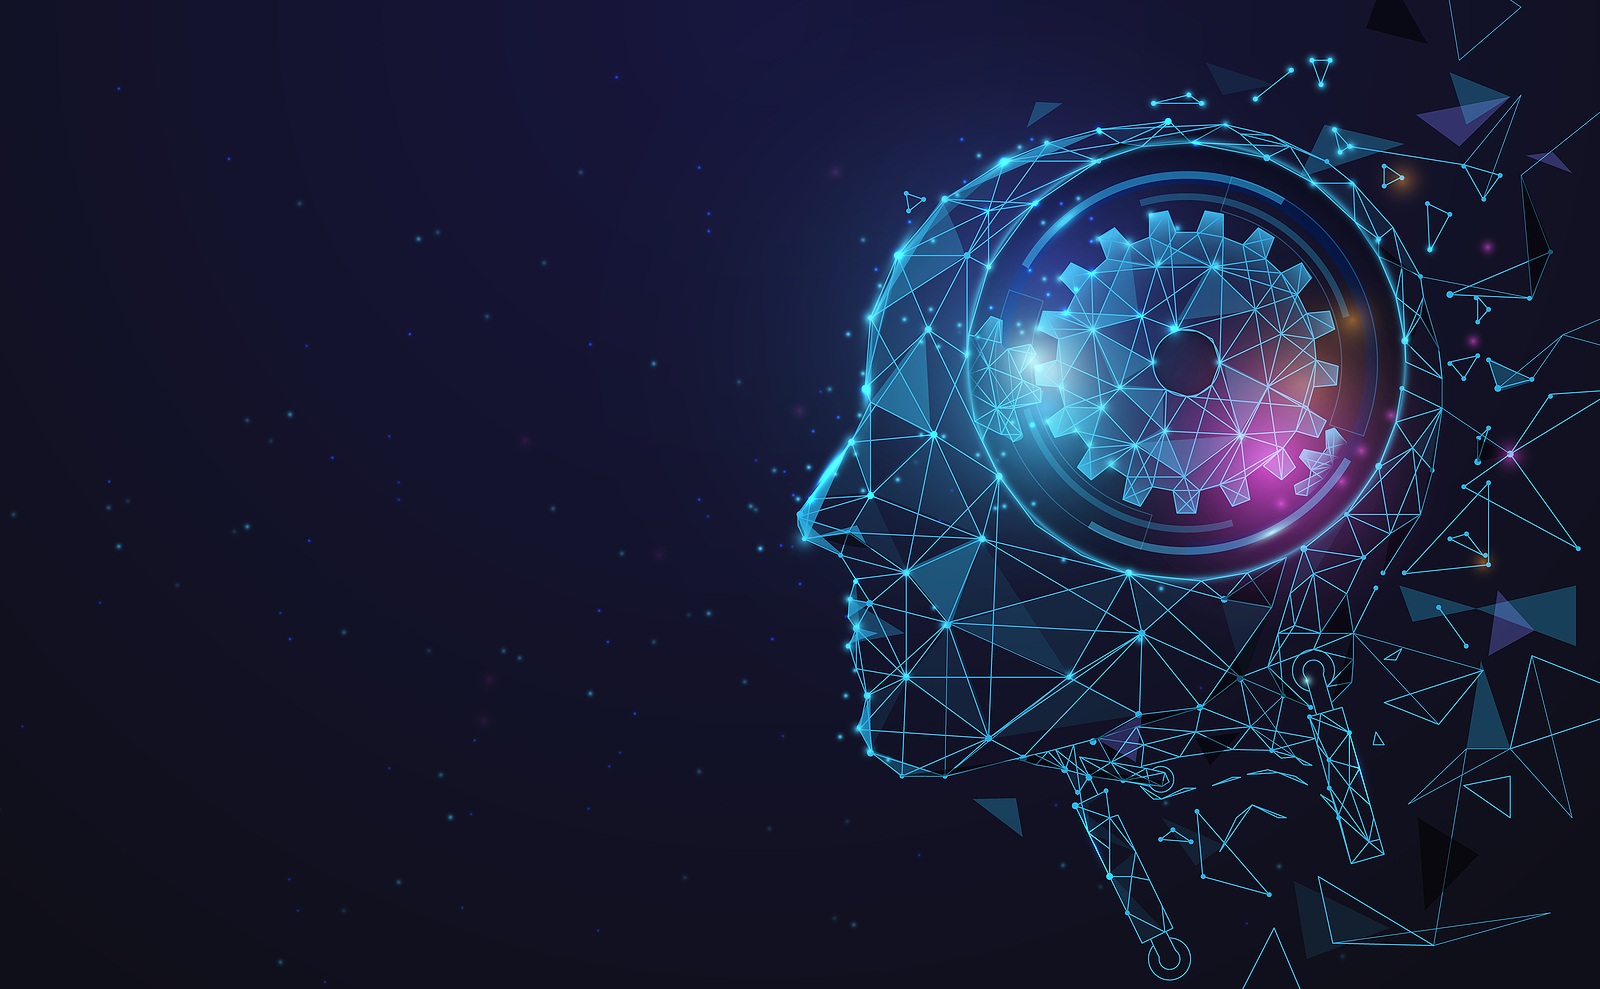 Artificial Intelligence Image, AI stocks